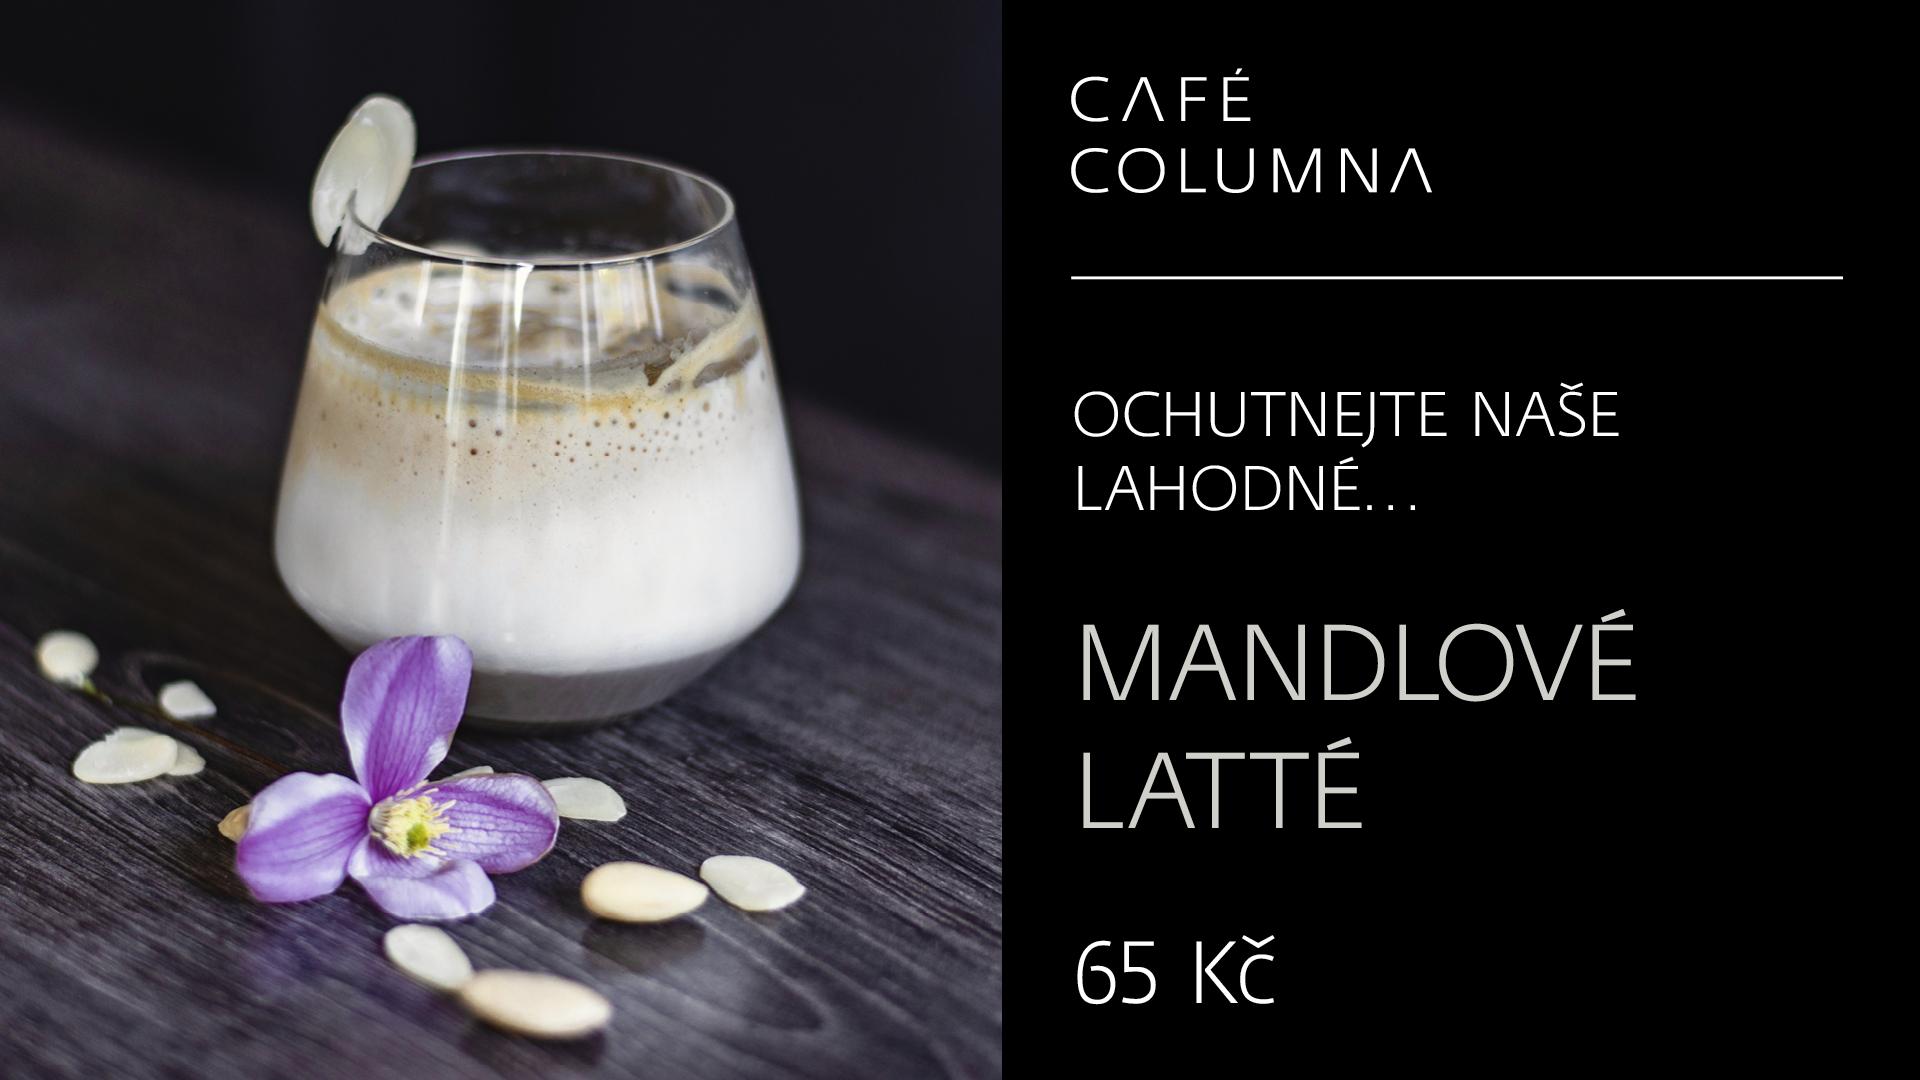 Café_Columna_LCD_1920x1080px_Mandlove_latte